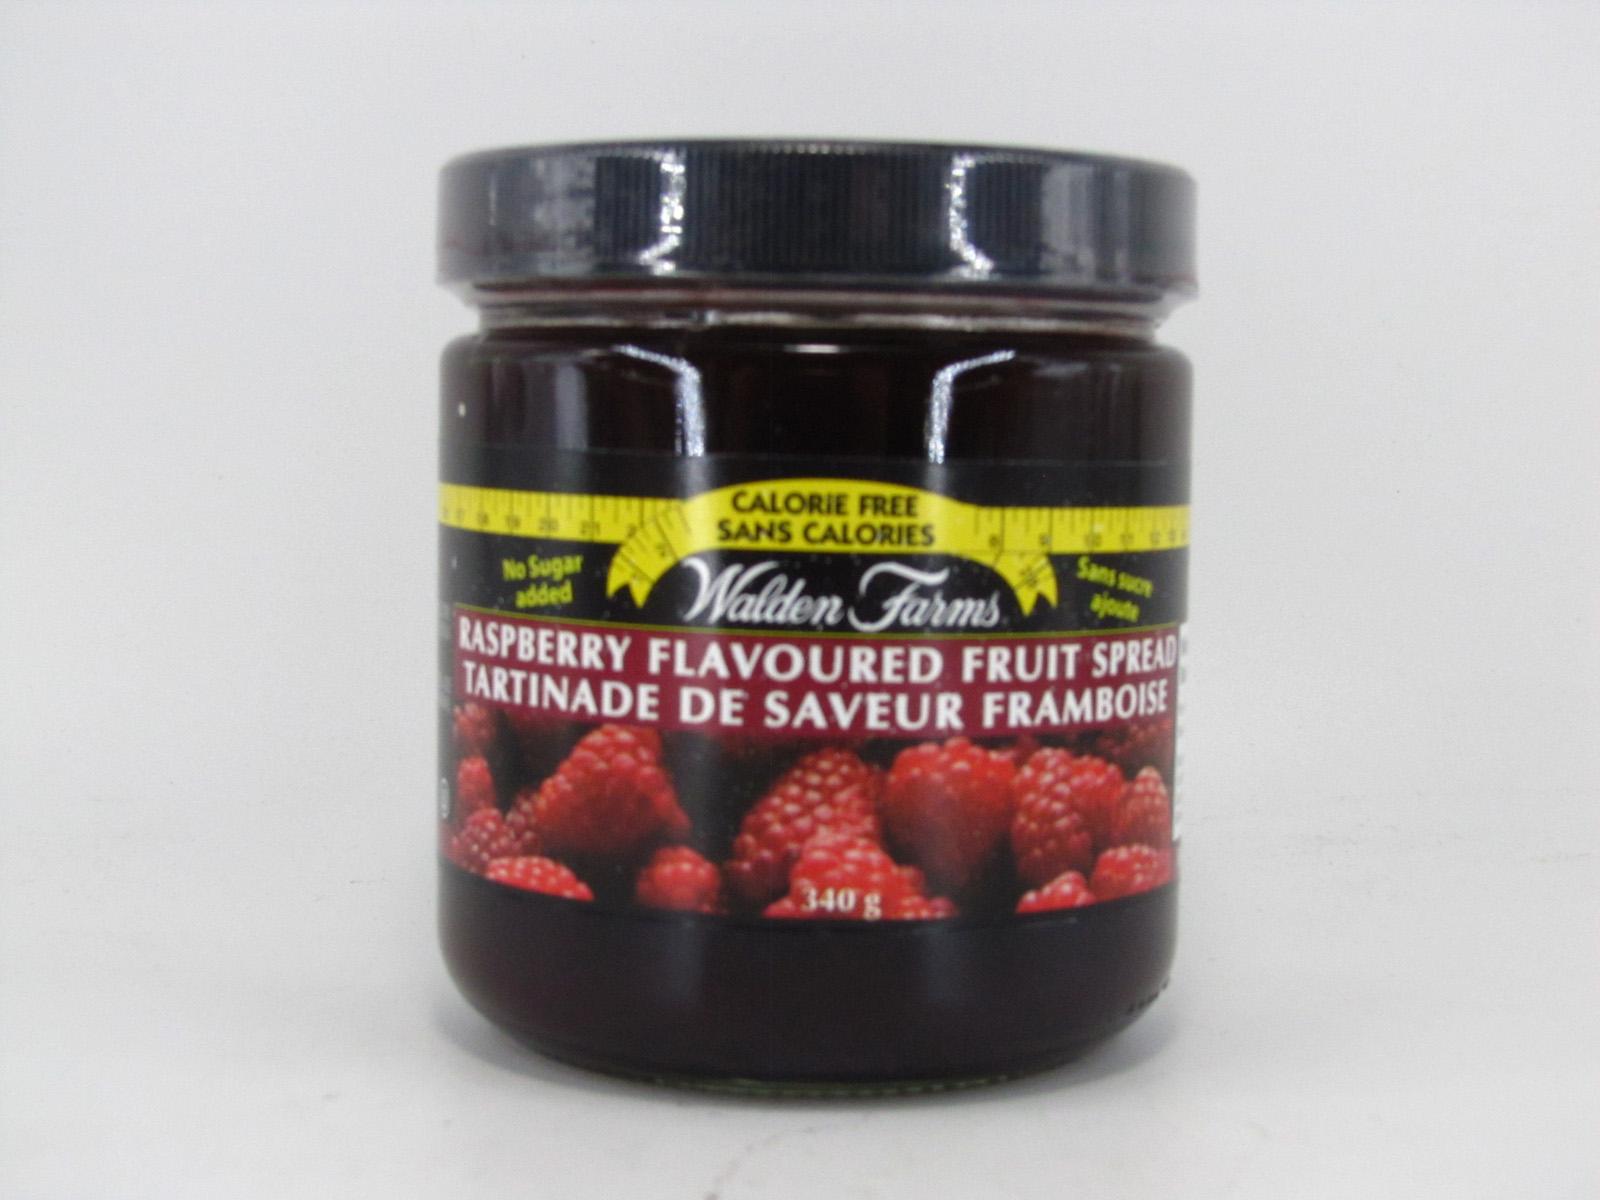 Waldenfarms Fruit Spread - Raspberry - front view